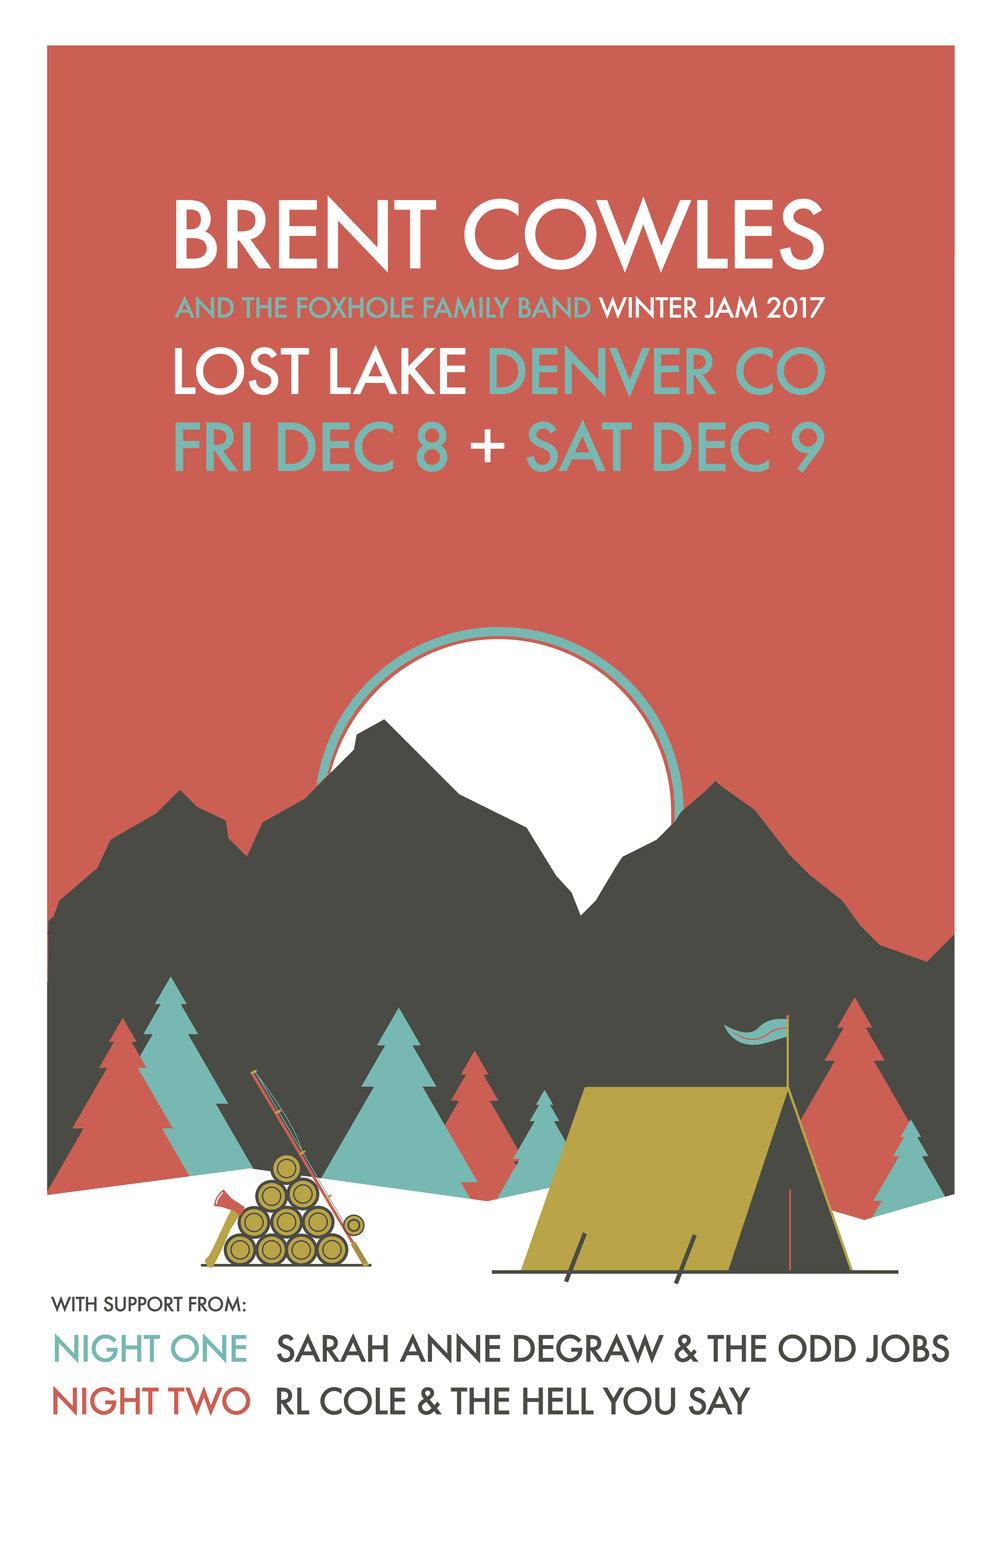 brent_LostLake_WinterJam2017-01.jpg